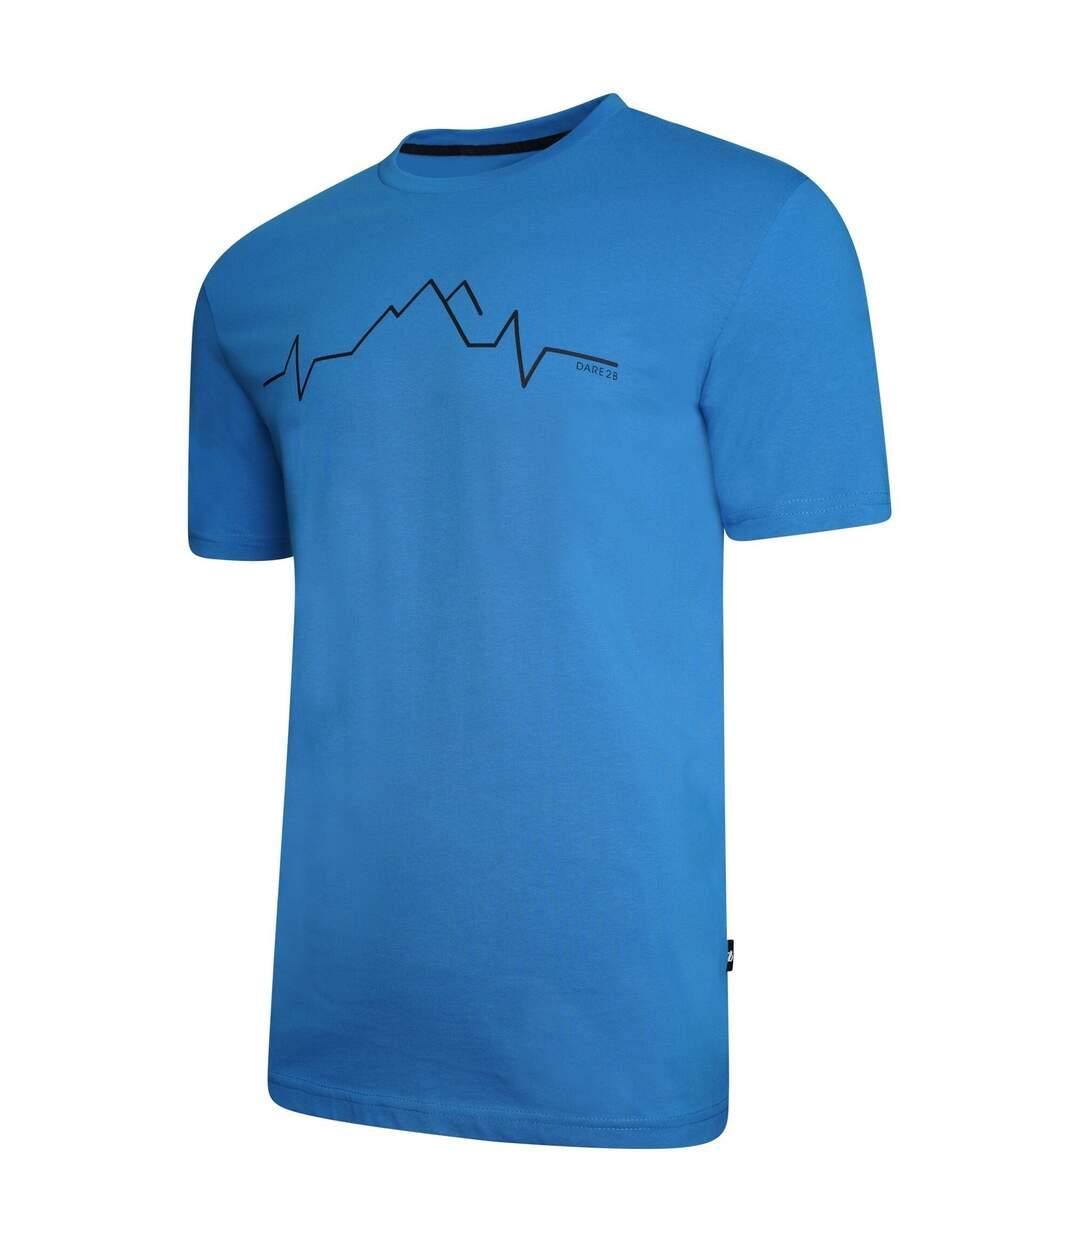 Dare 2B Mens Differentiate Graphic T-Shirt (Methyl Blue) - UTRG5020